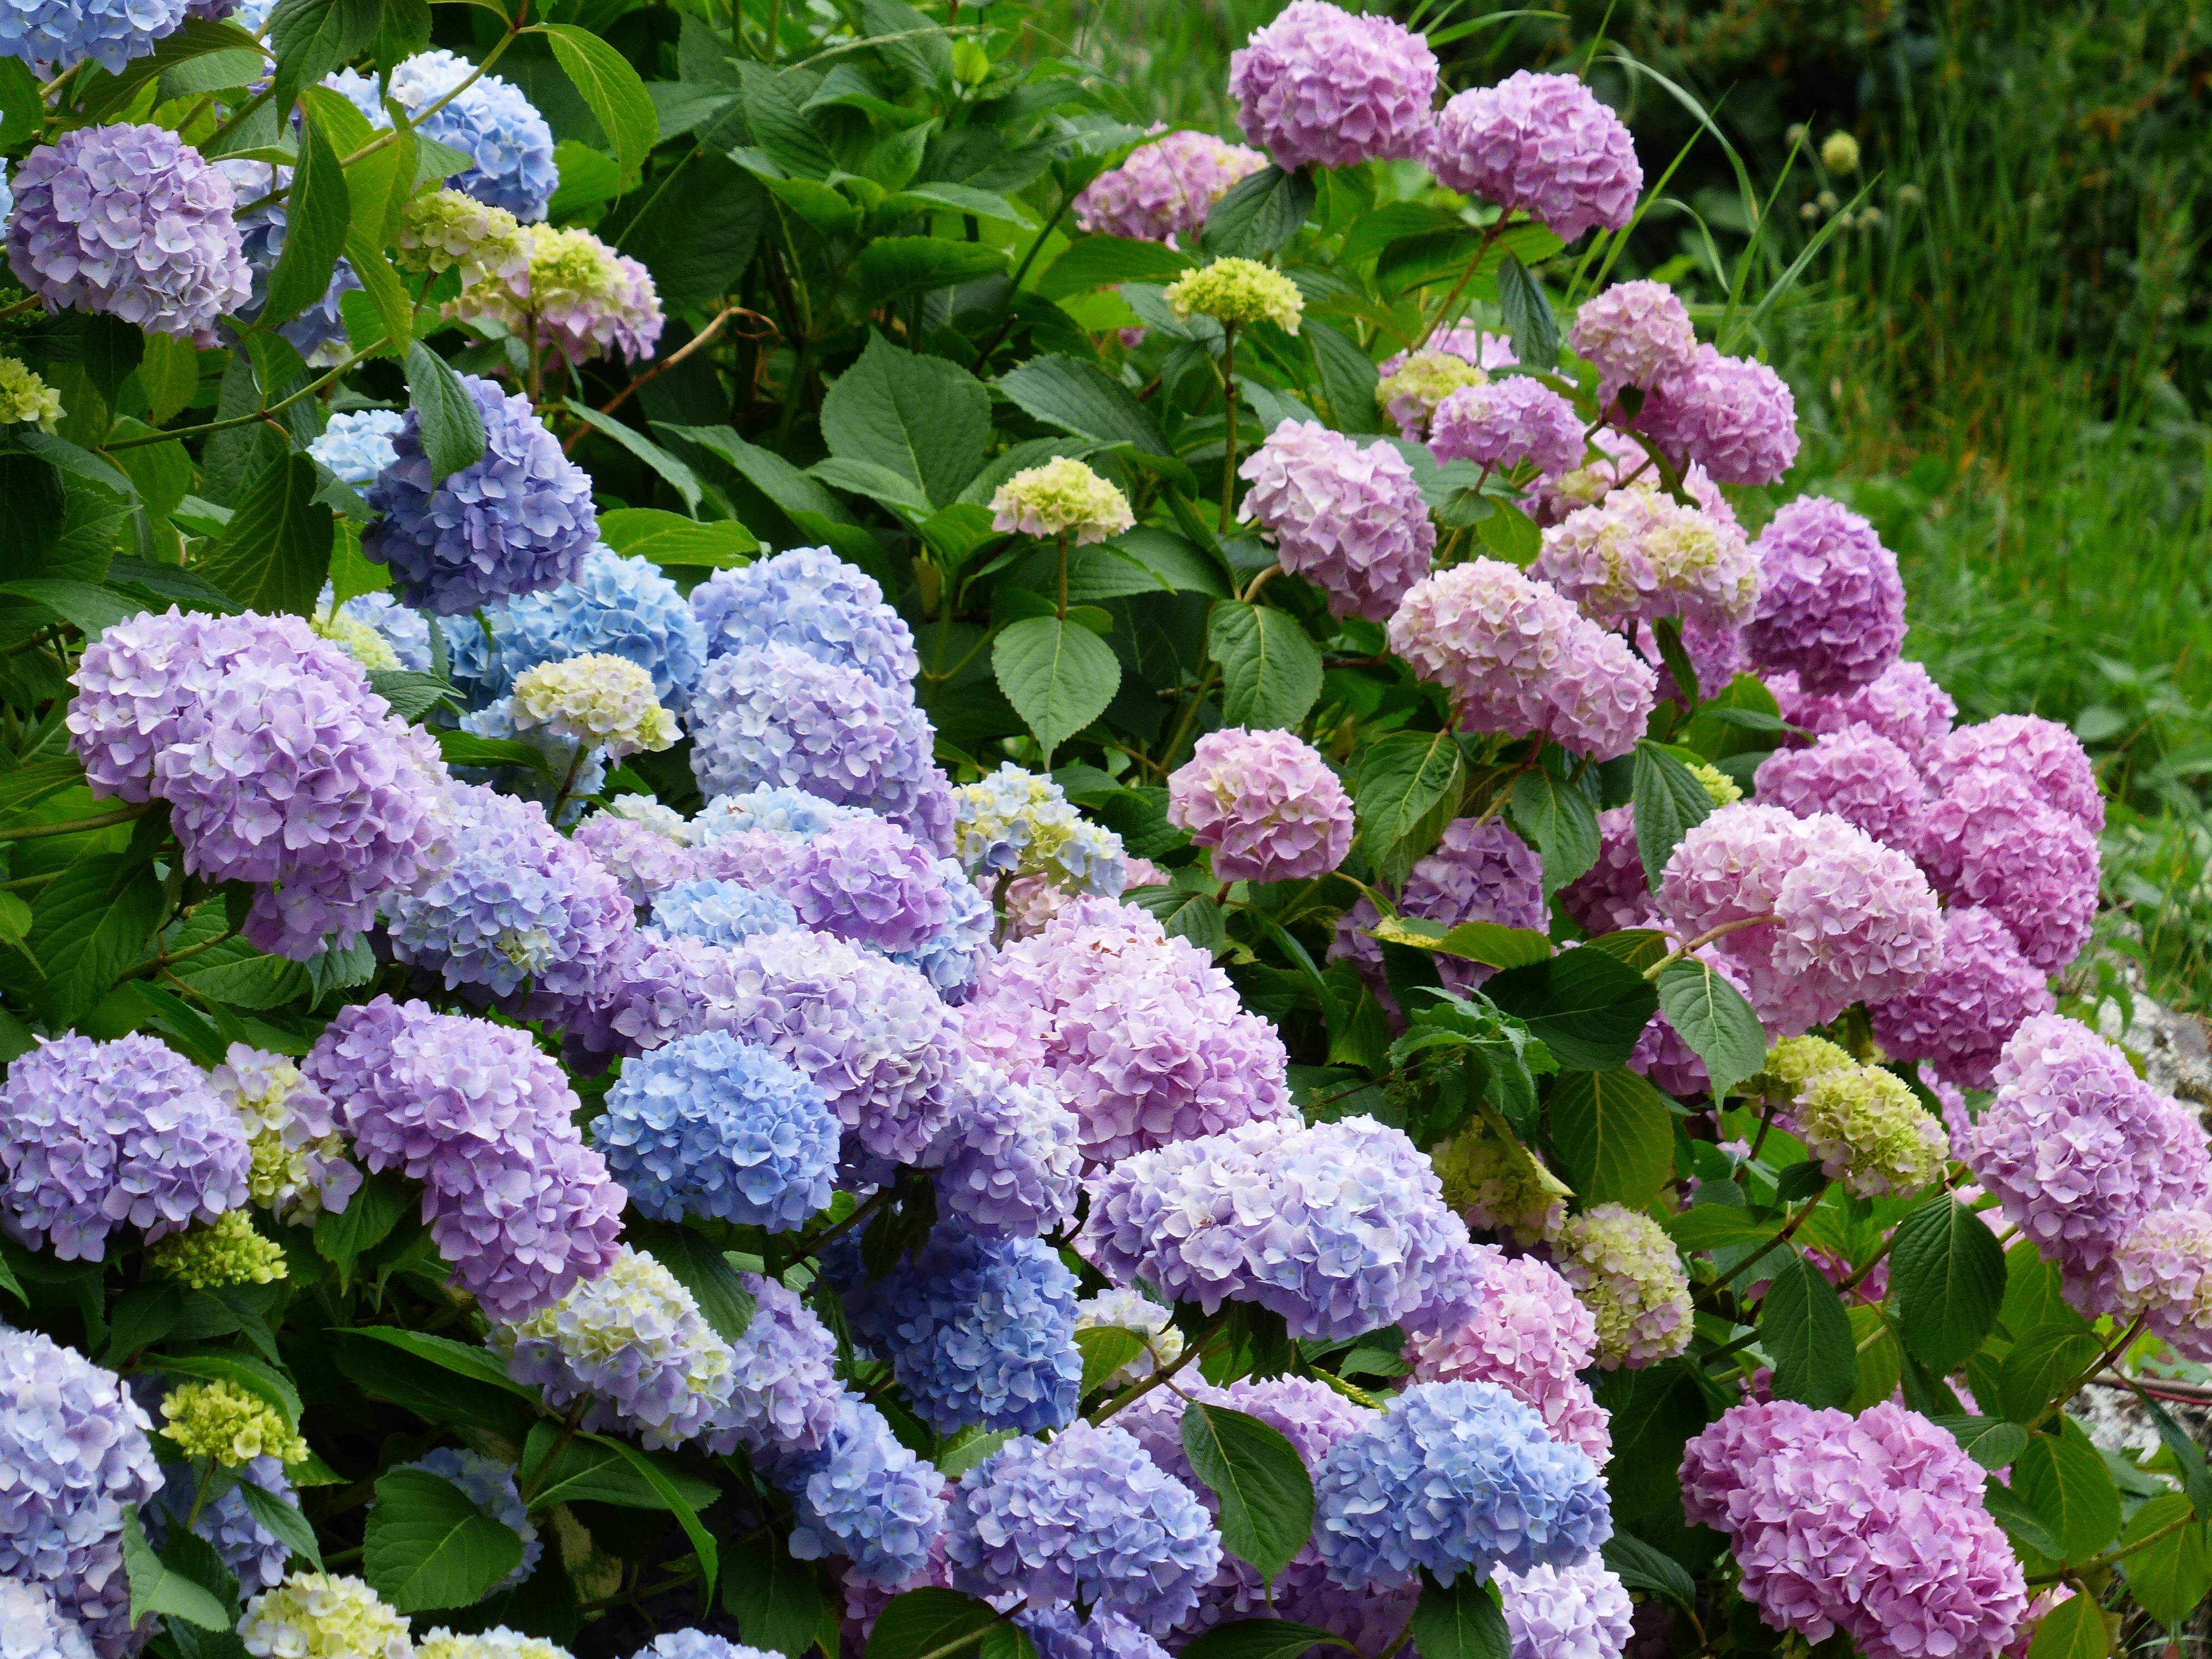 Free images blossom flower purple bloom bush blue pink blossom plant flower purple bloom bush blue pink hydrangea flowers shrub violet ornamental shrub hydrangeas flowering mightylinksfo